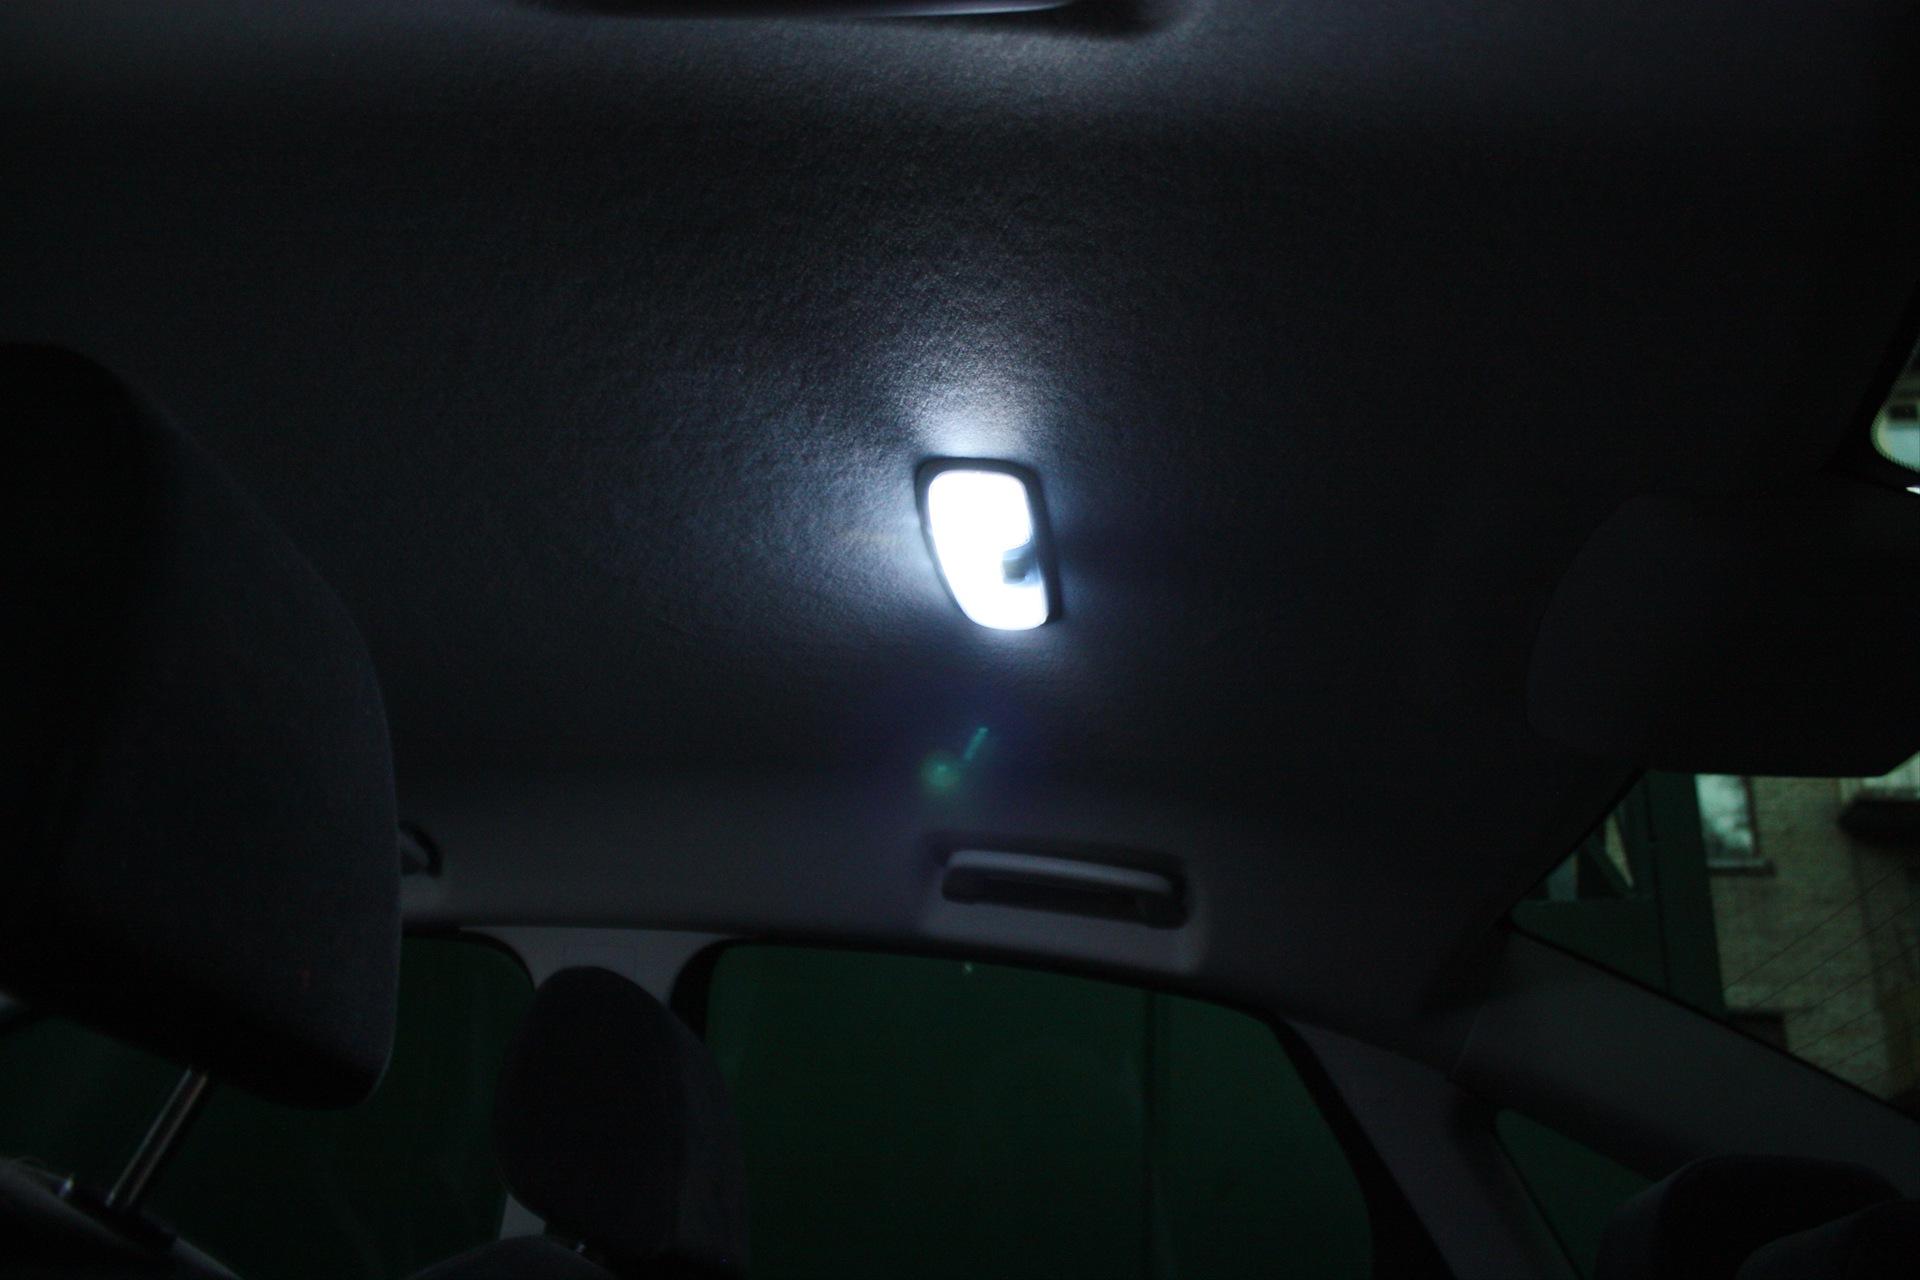 Подсветка в зеркала форд фокус 2 своими руками